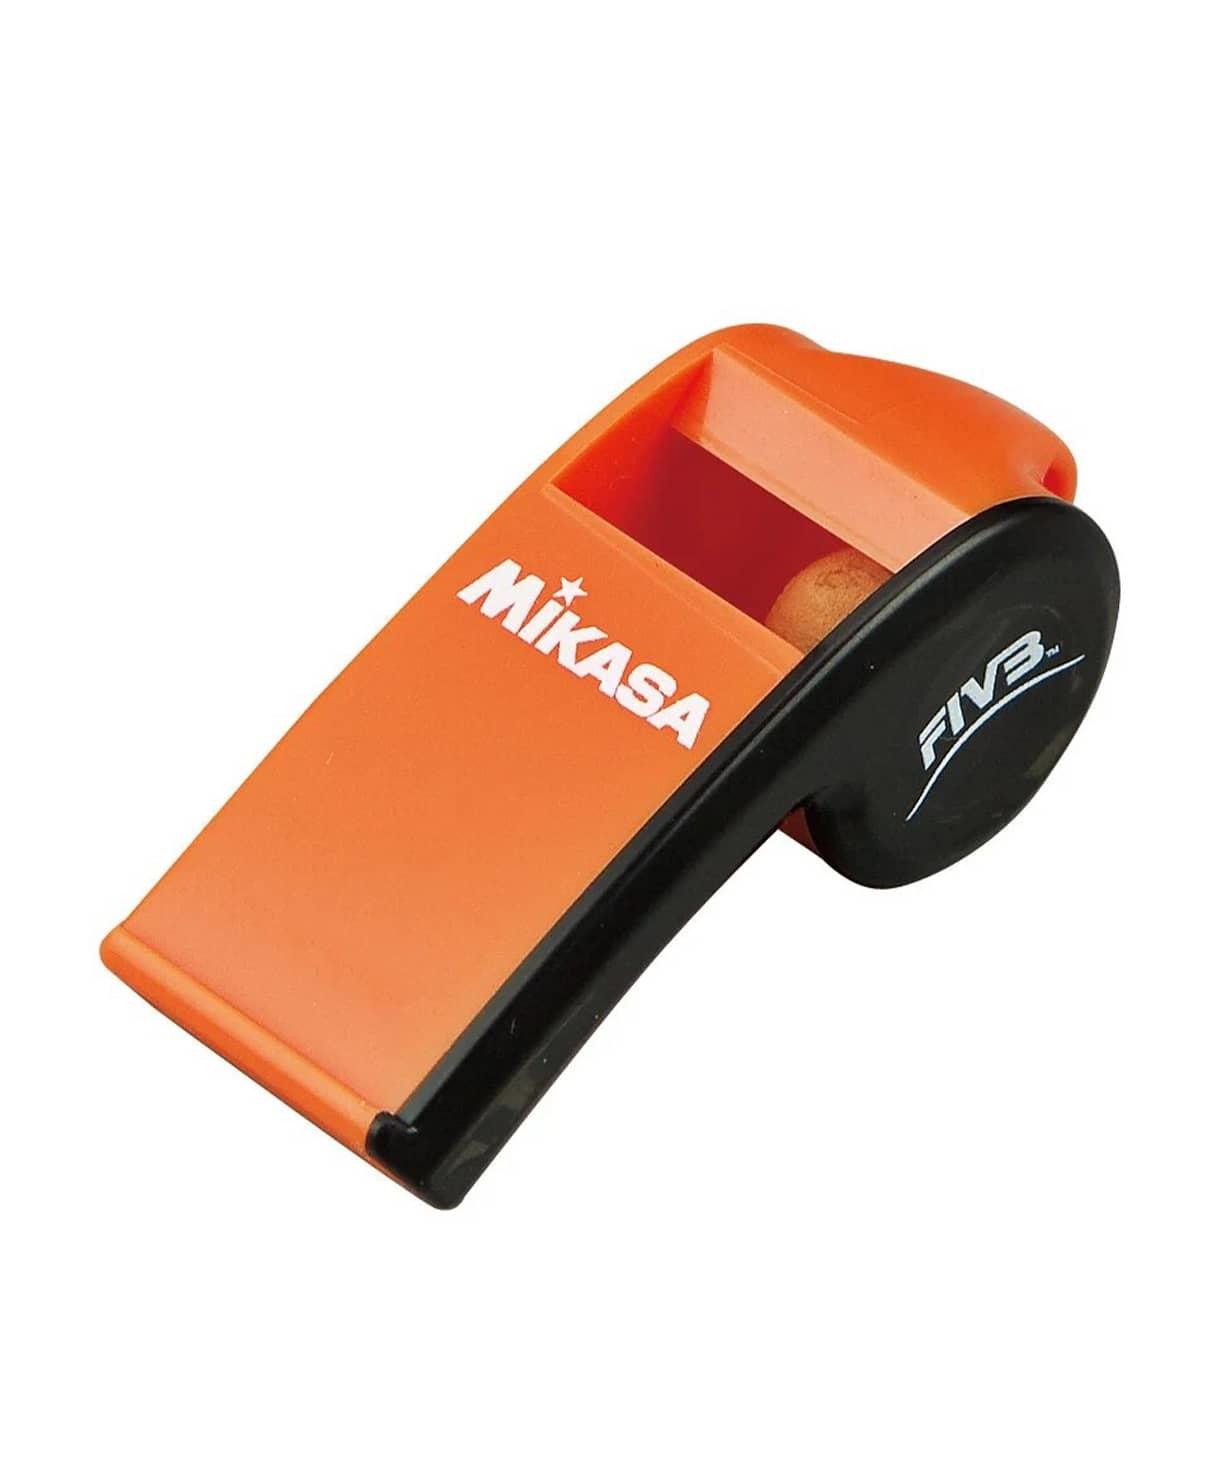 Свисток Mikasa PUL MASTER, оранжевый